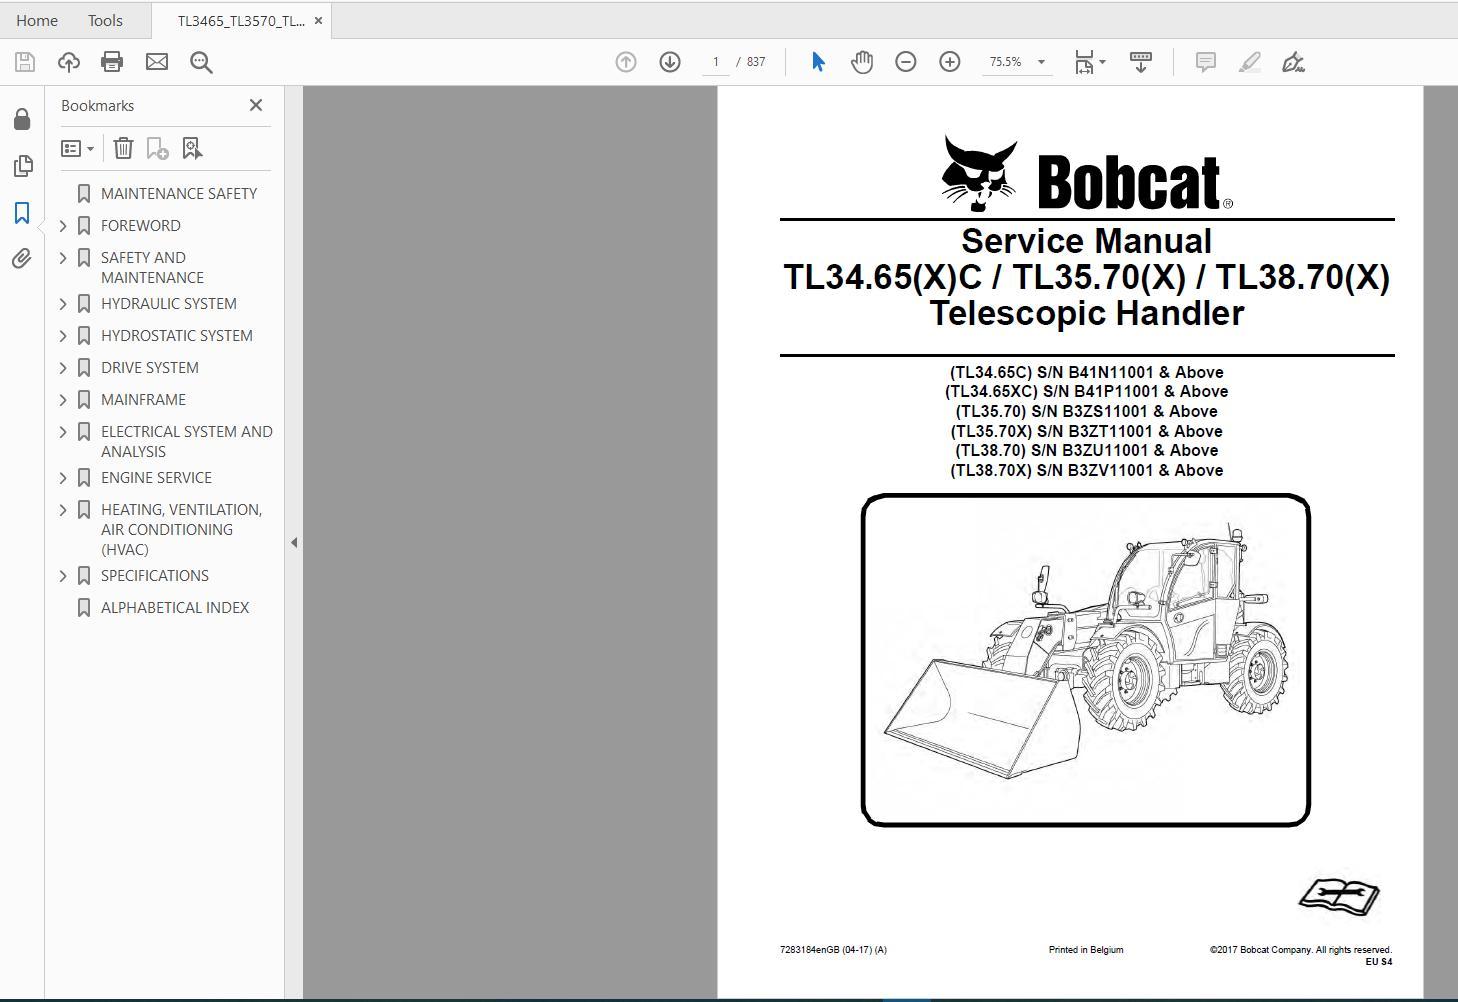 Bobcat_Versa_HANDLER_TTC_Telescopic_Handler_Service_Library_2017_DVD10